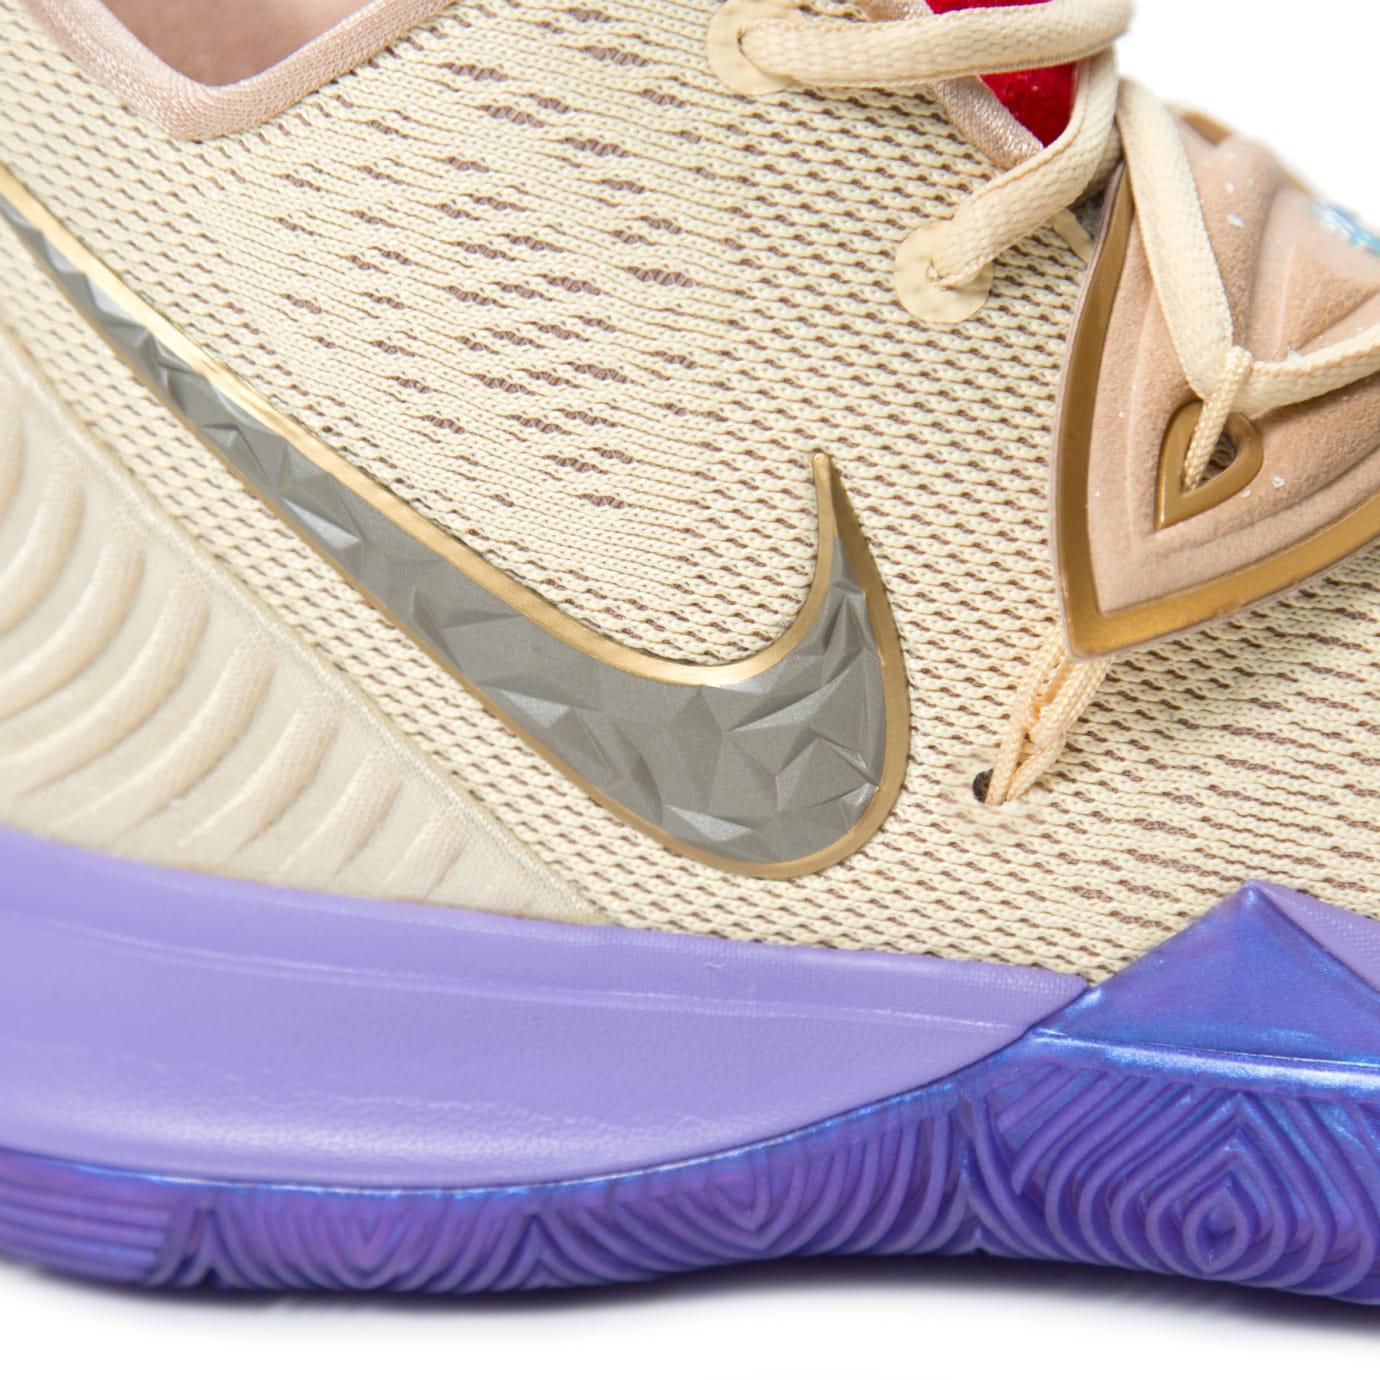 Concepts x Nike Kyrie 5 'Ikhet' (Swoosh)